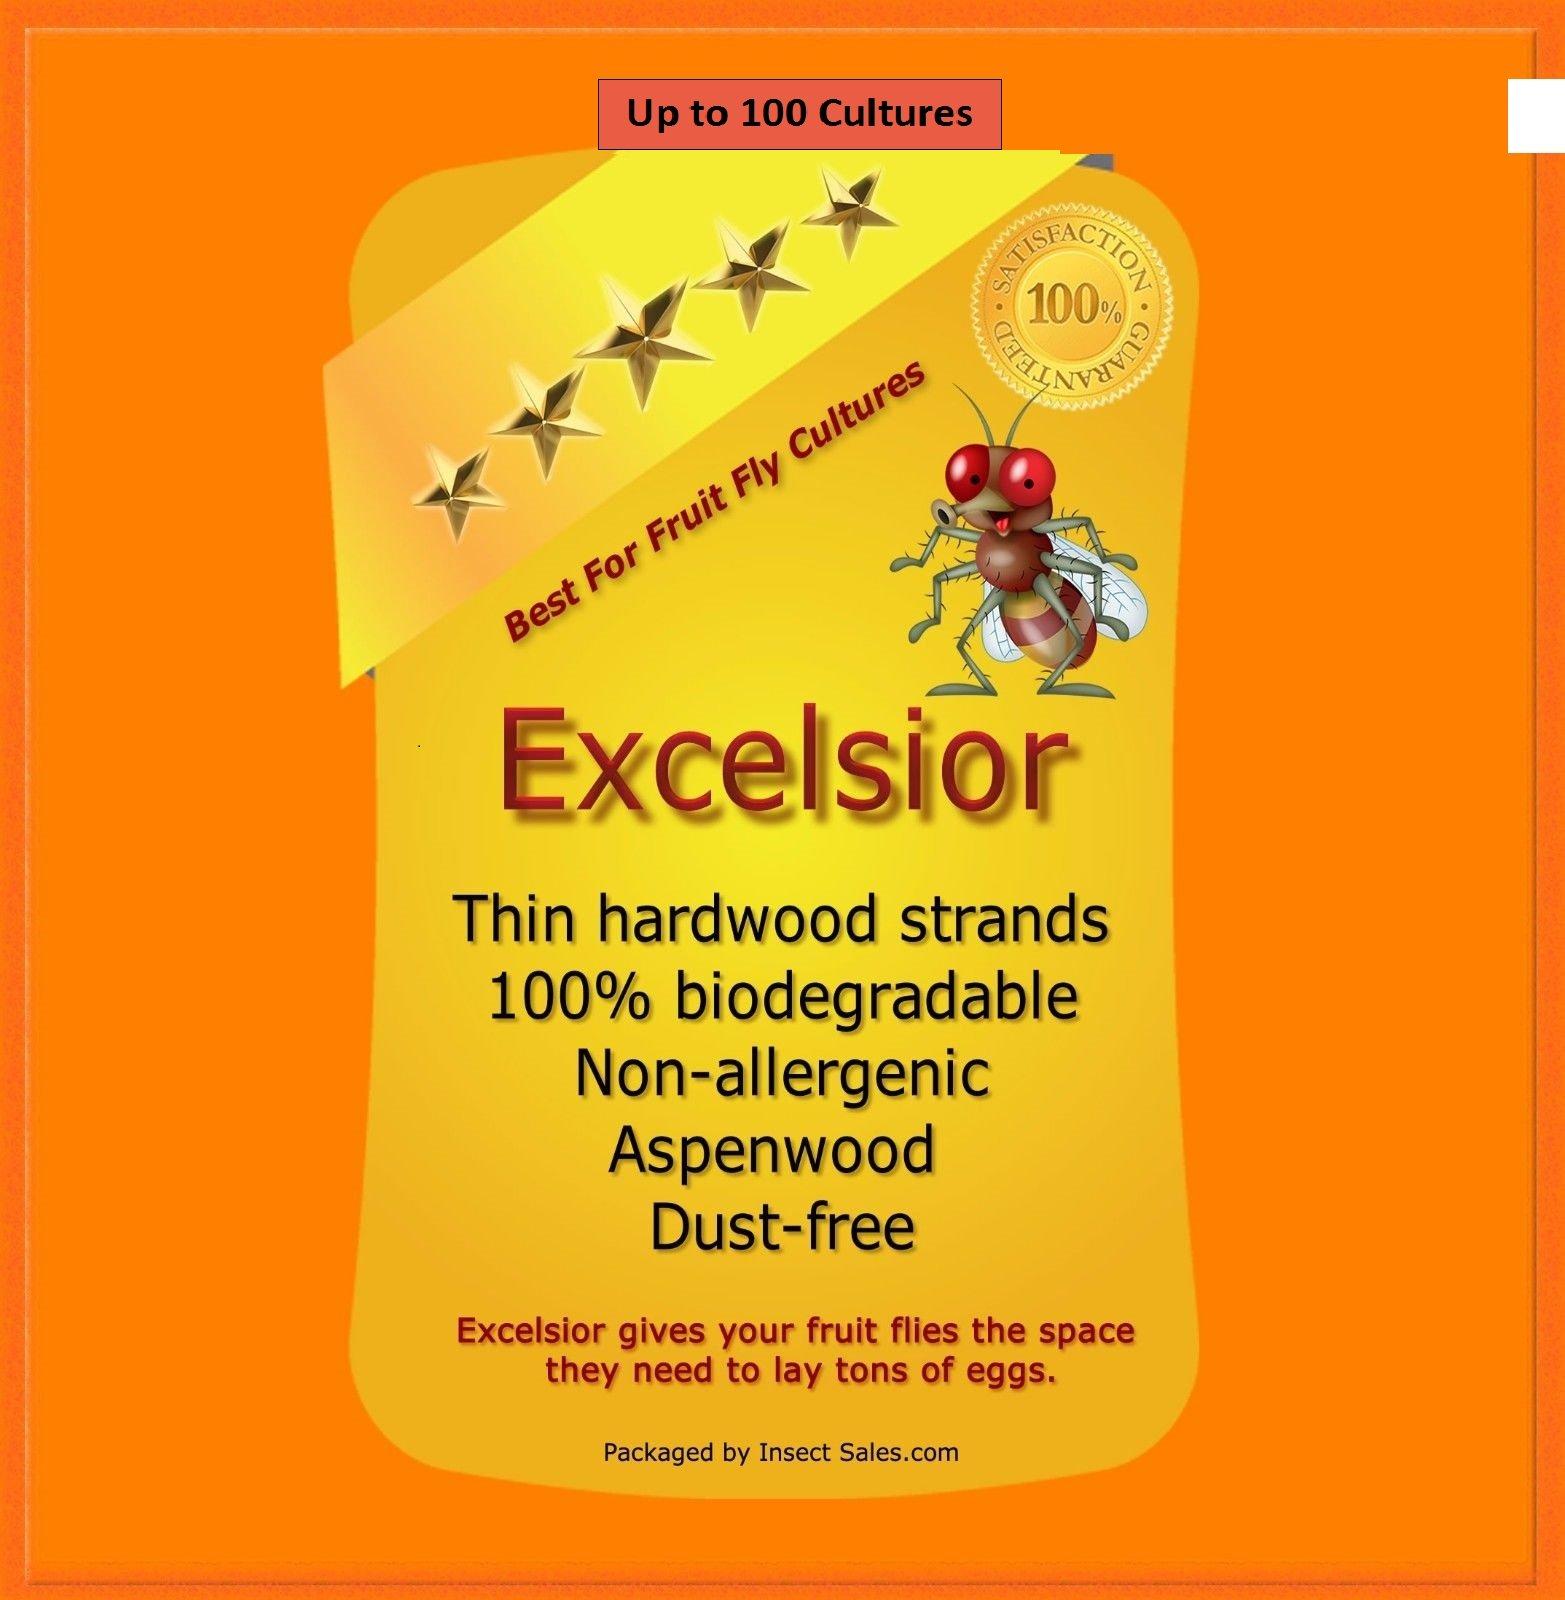 Excelsior (Aspen Wood) Fine Fiber - Will Make approx. 100 Fruit Fly Cultures